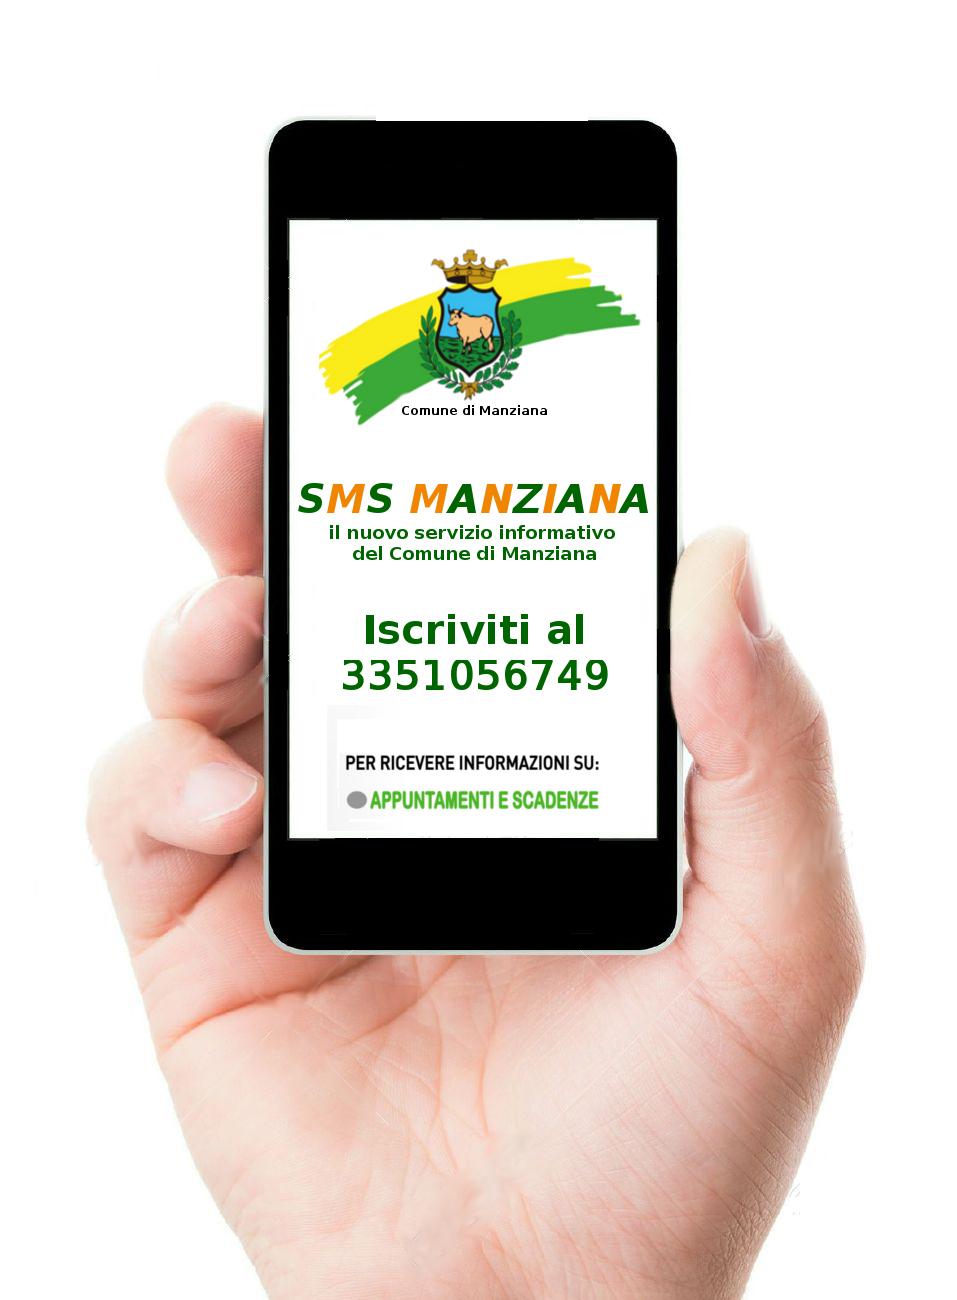 SMS MANZIANA